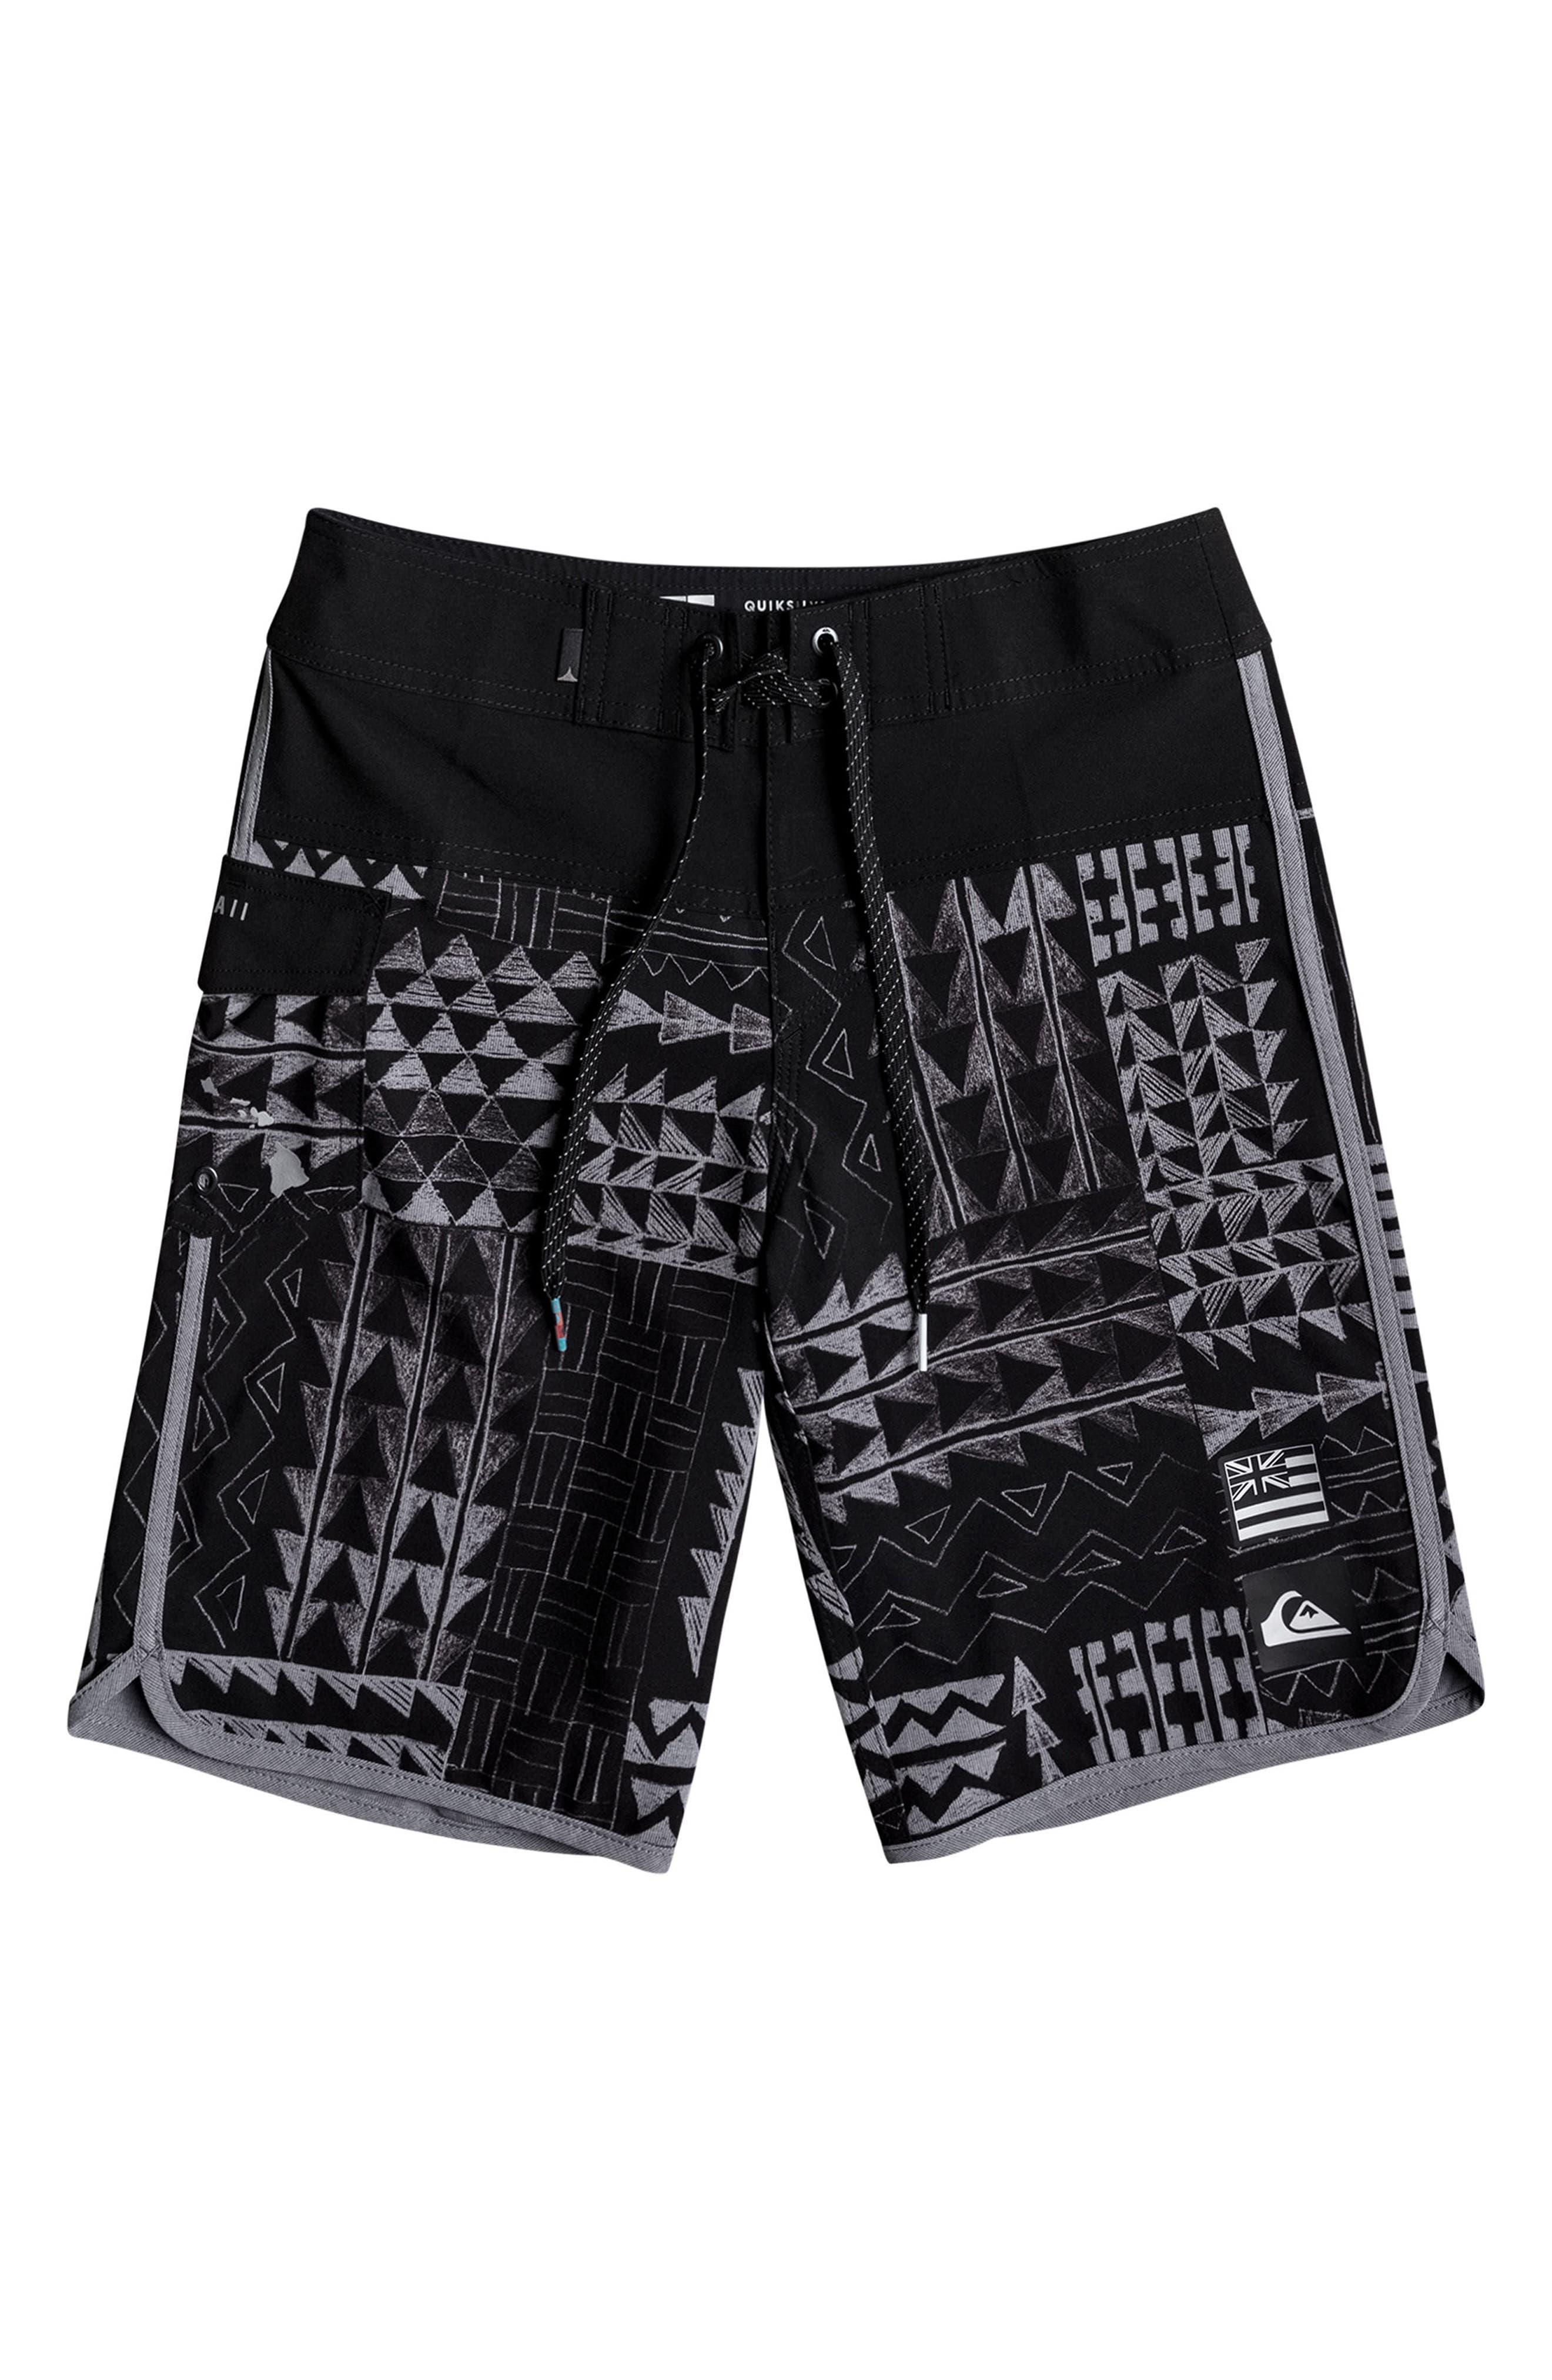 Main Image - Quiksilver Hawaii Scallop Board Shorts (Big Boys)